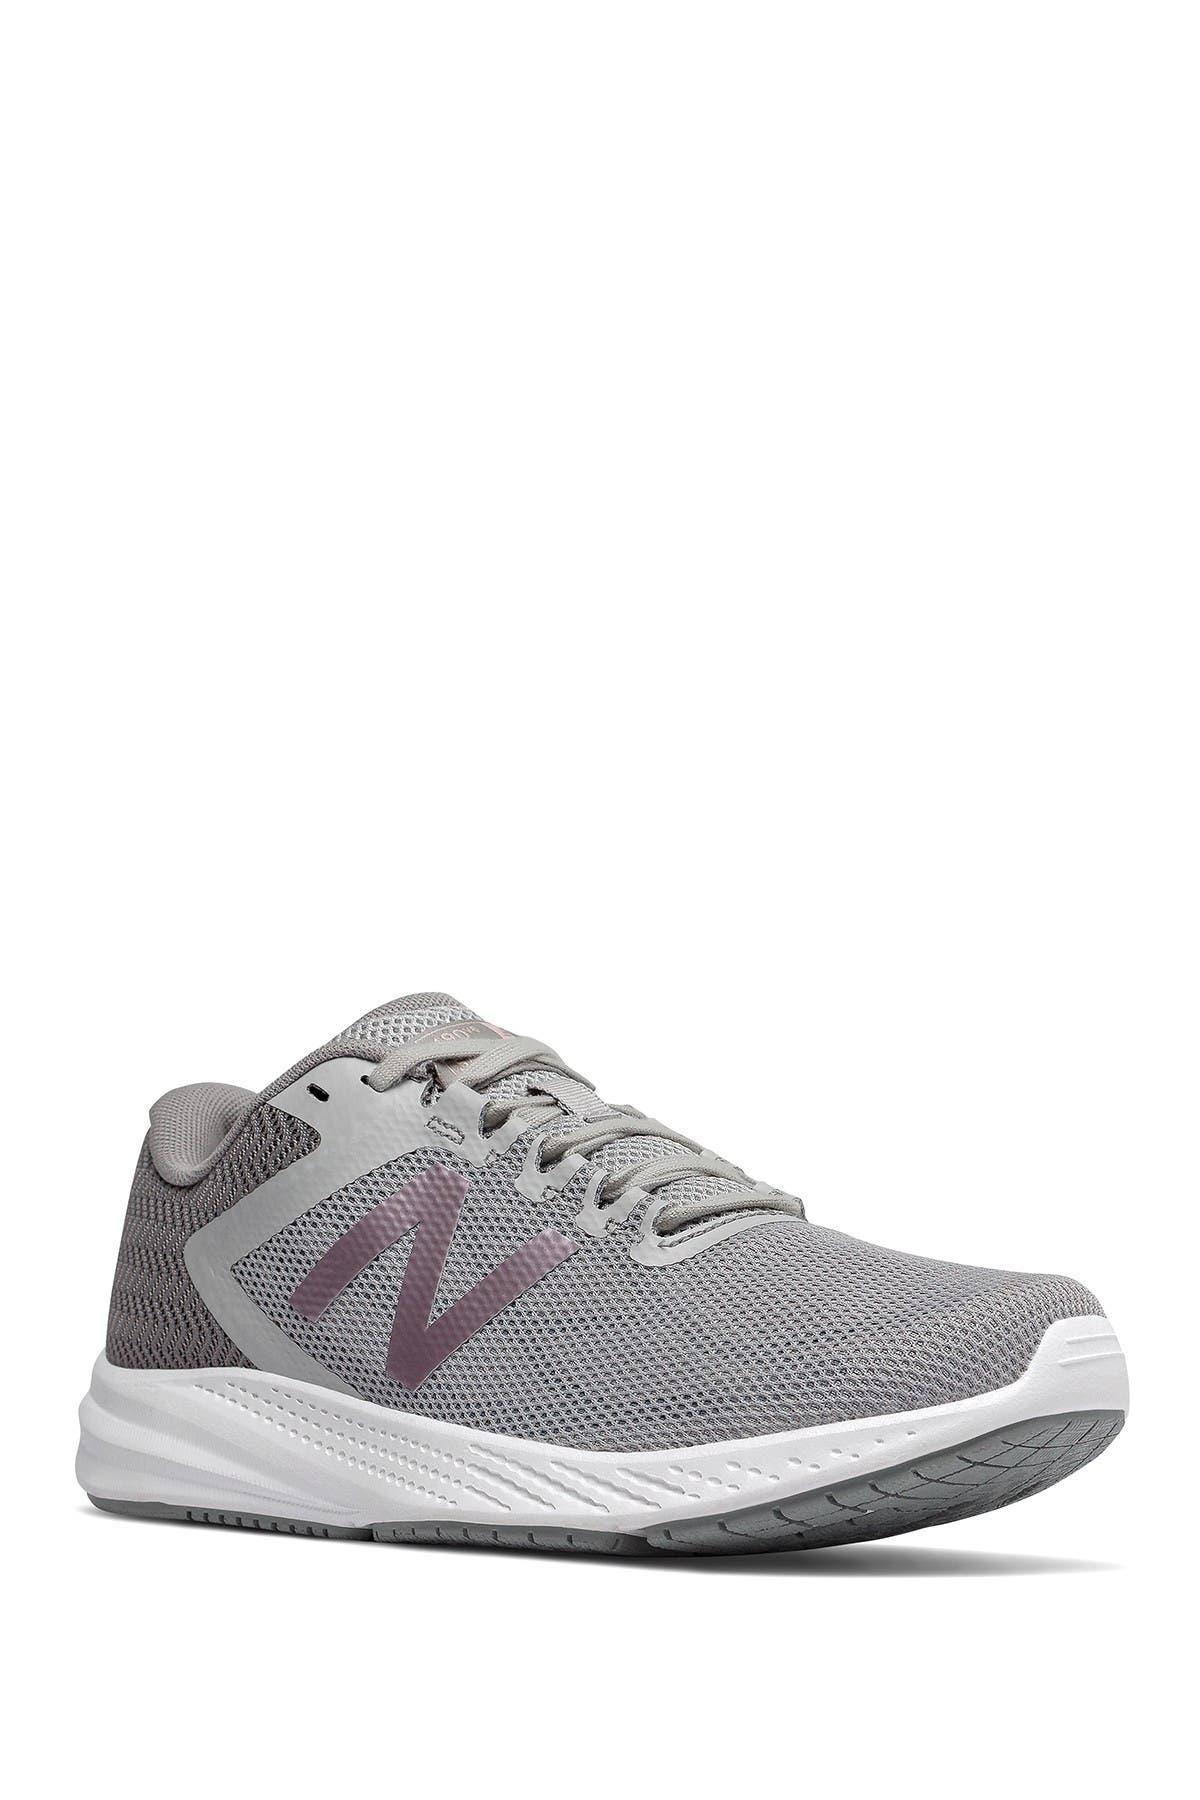 New Balance | 490v6 Running Shoe - Wide